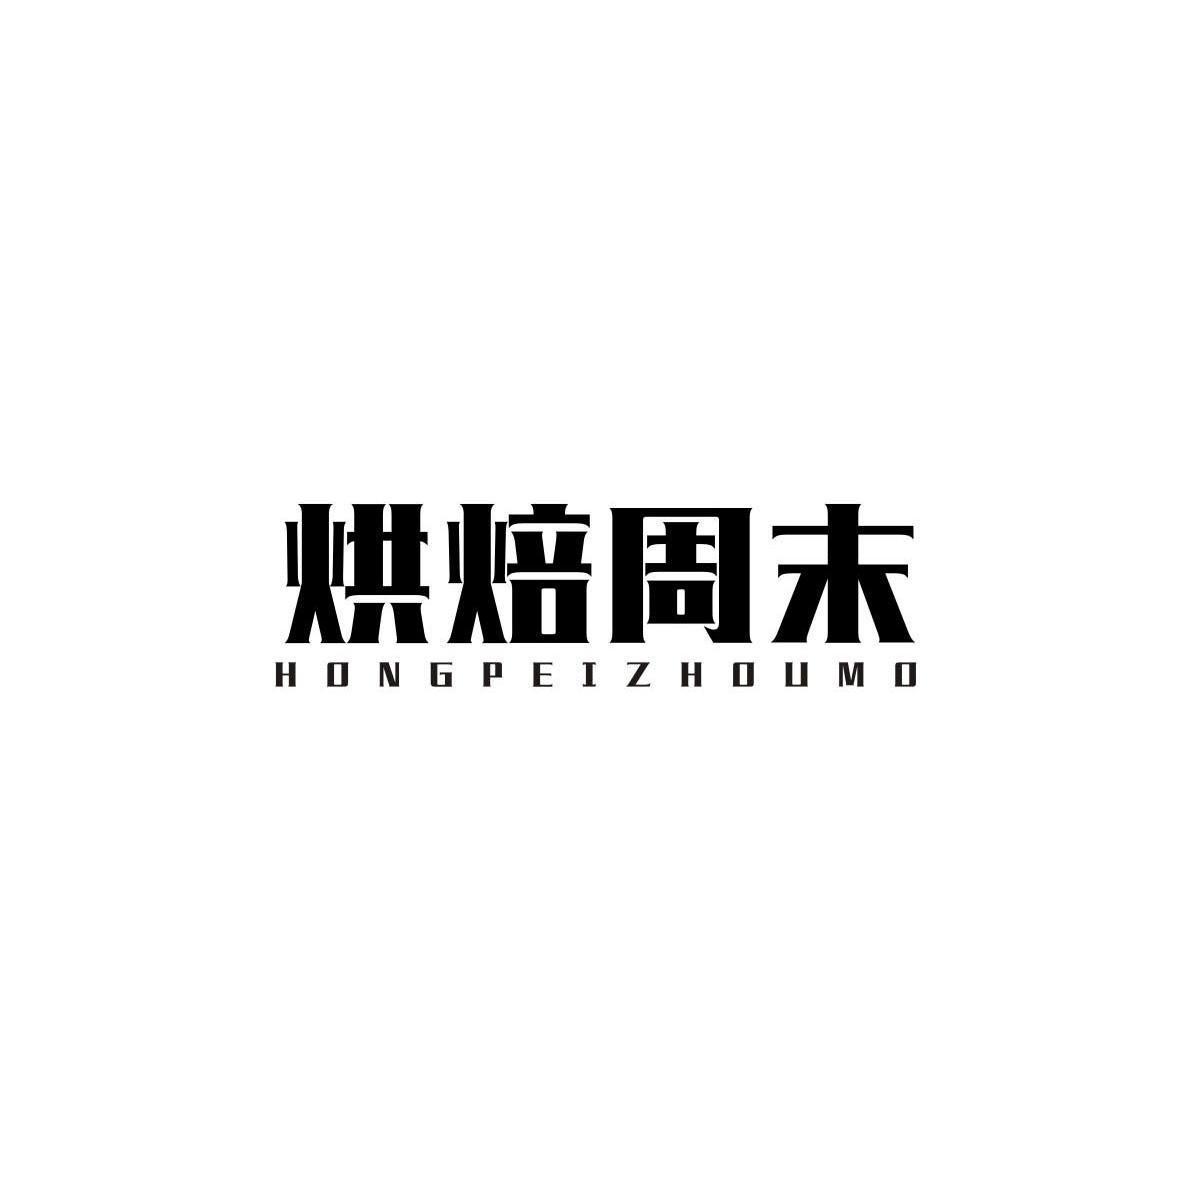 烘焙周末HONGPEIZHOUMO